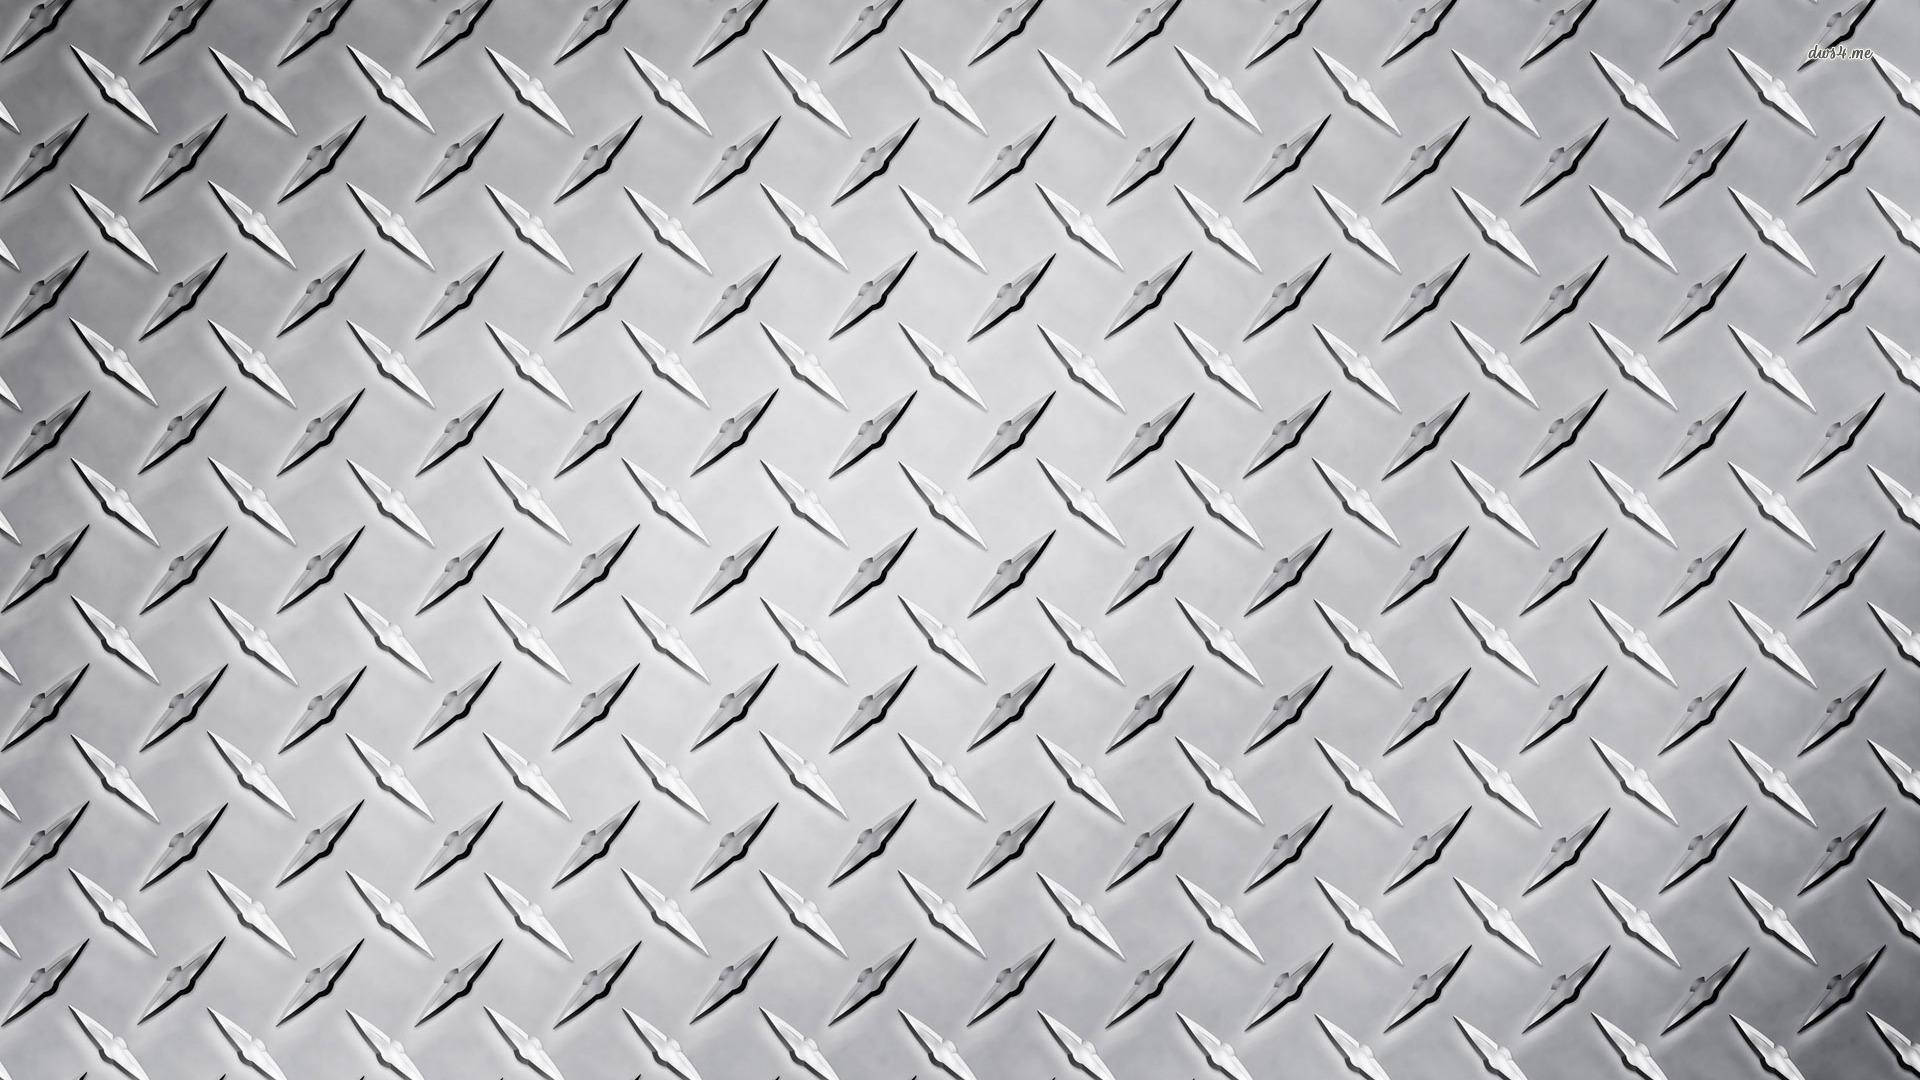 Diamond Plate Wallpaper 12068 12605 Hd Wallpapers